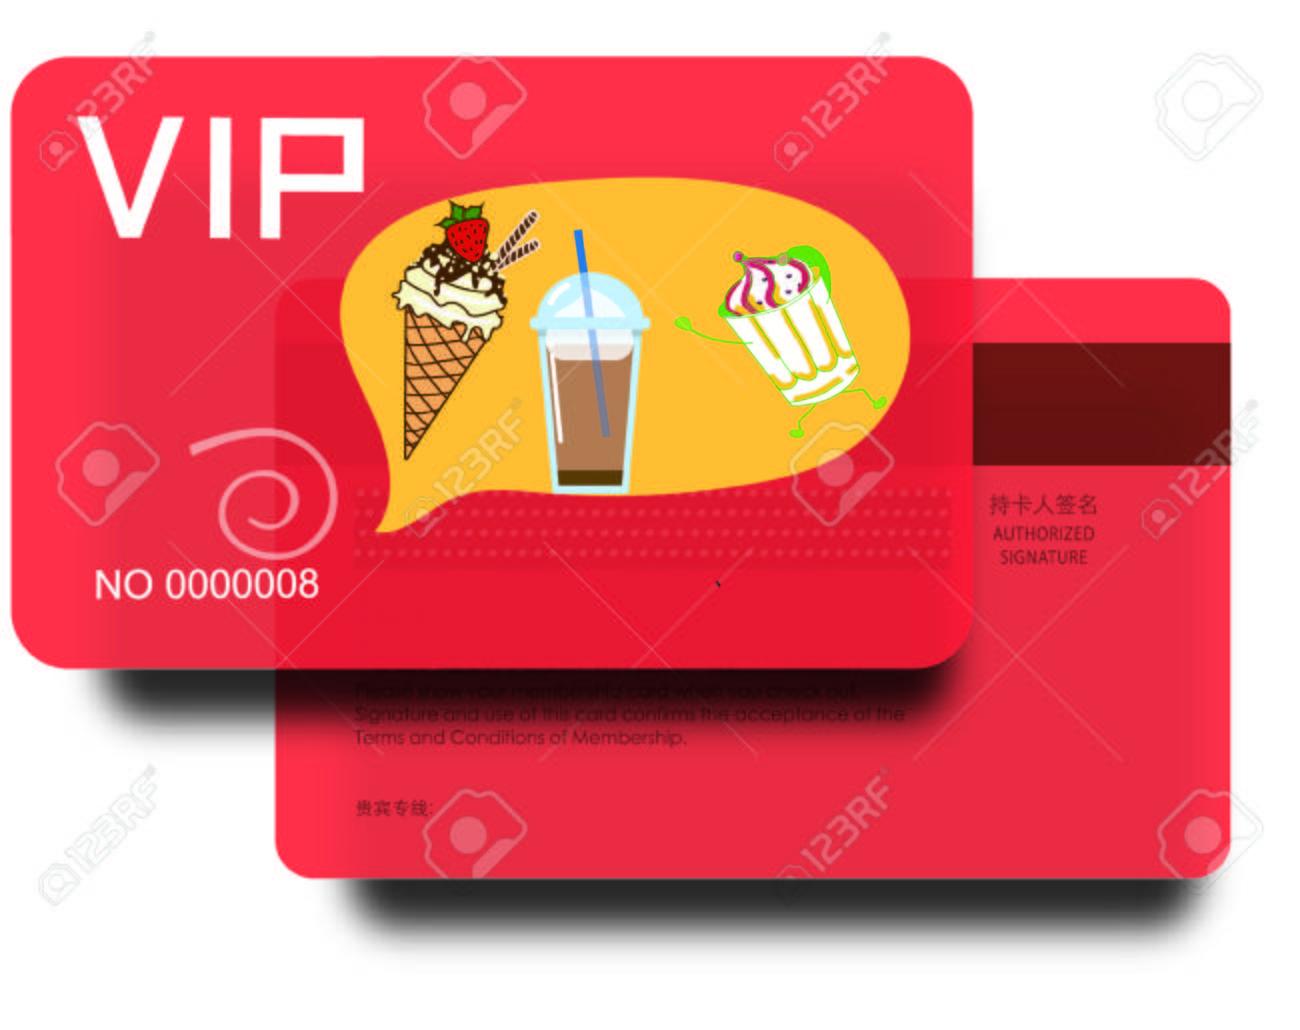 Membership Business Card Graphic Design Royalty Free Cliparts – Membership Card Design